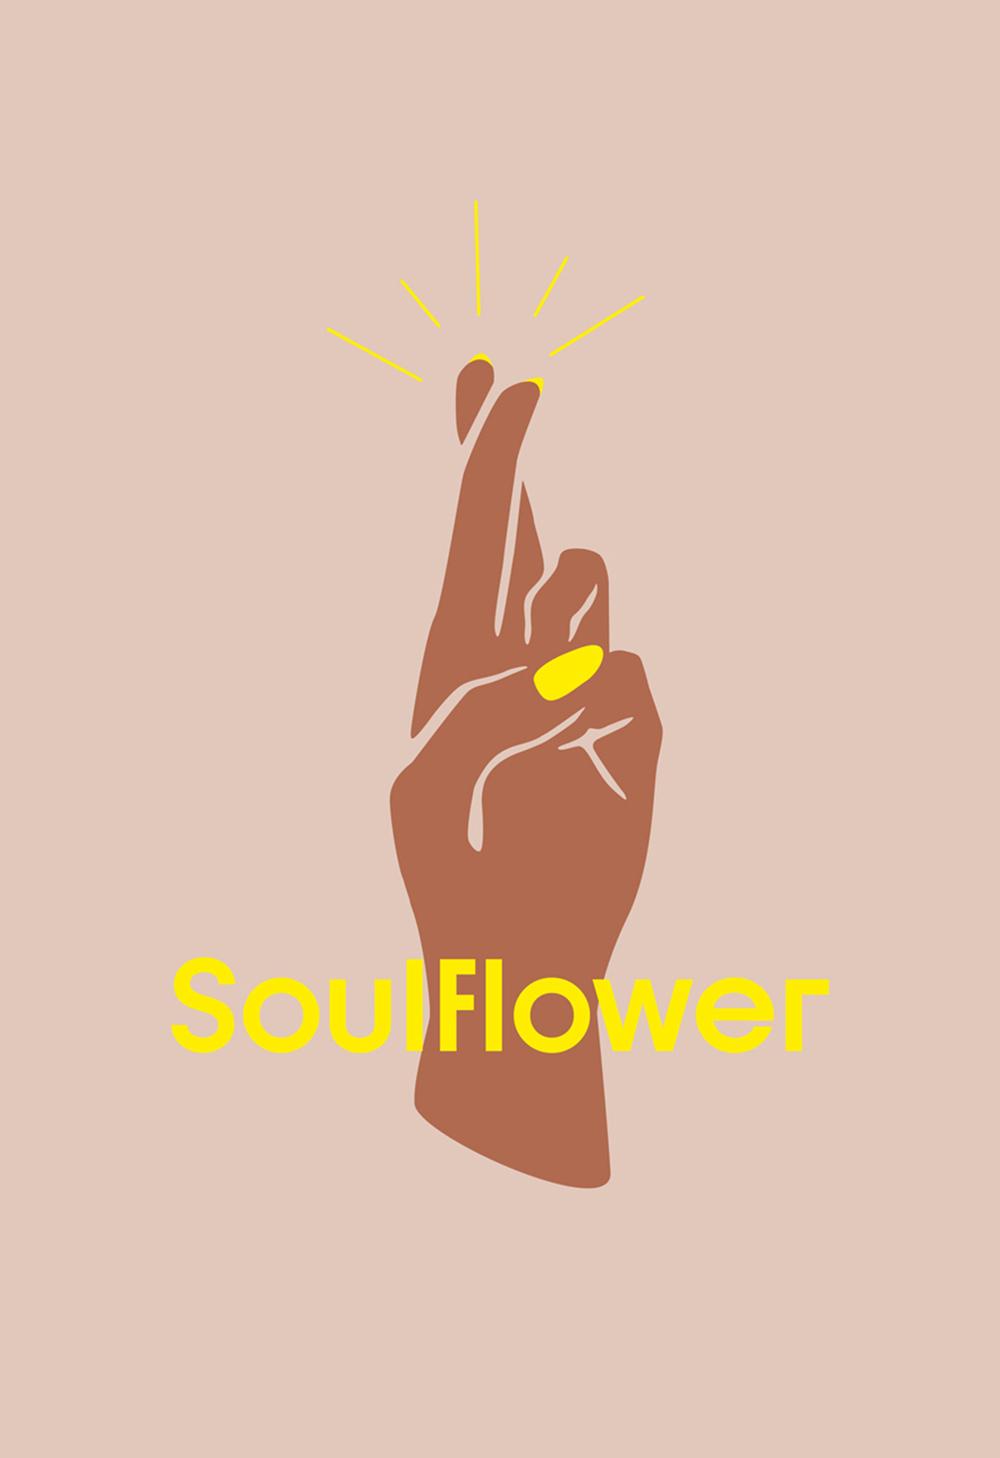 Soulfower California Florist Logo Start